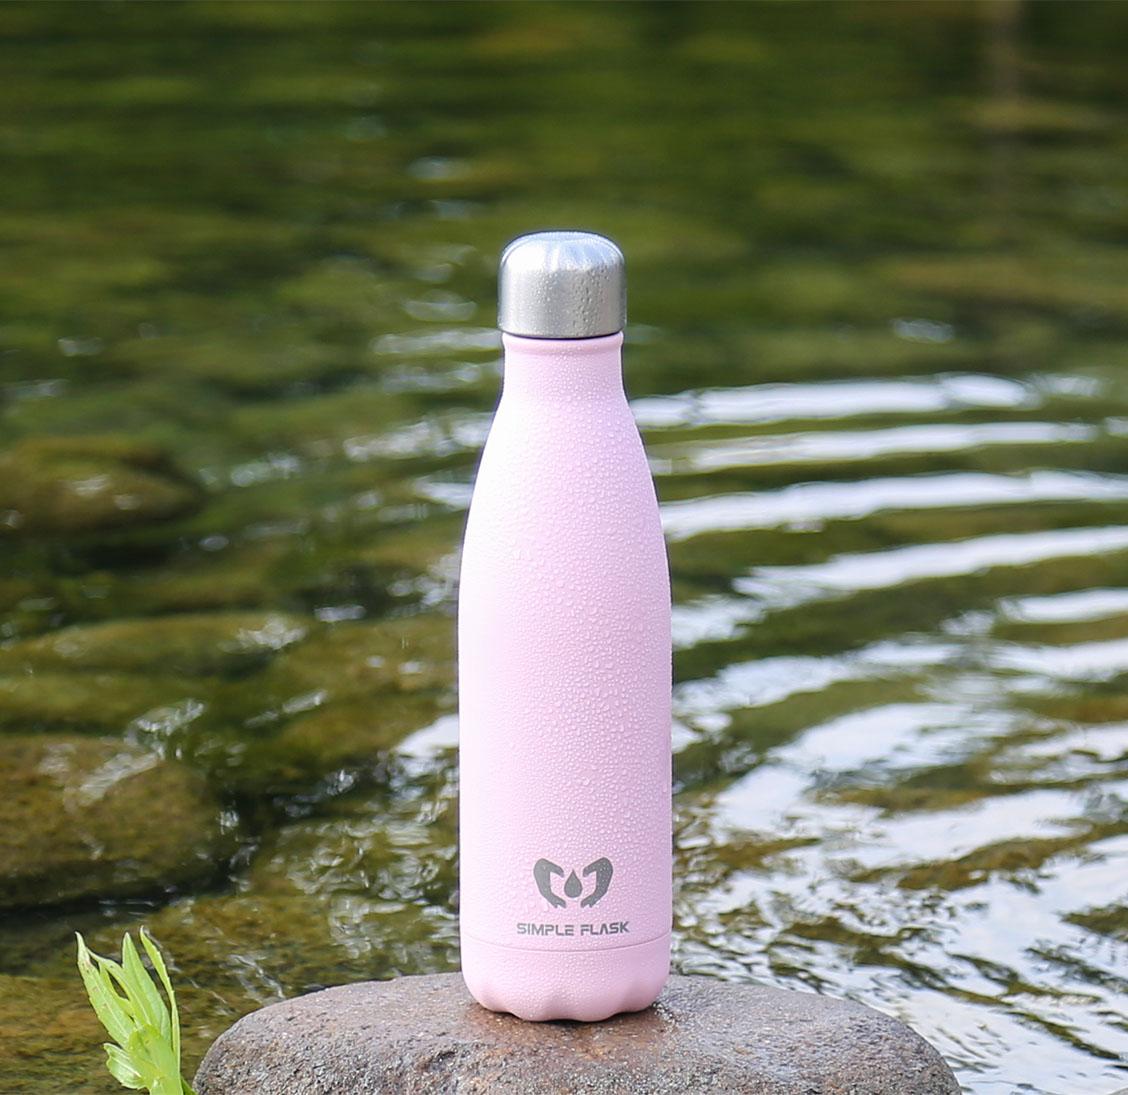 Simple Flask stainless steel water bottle